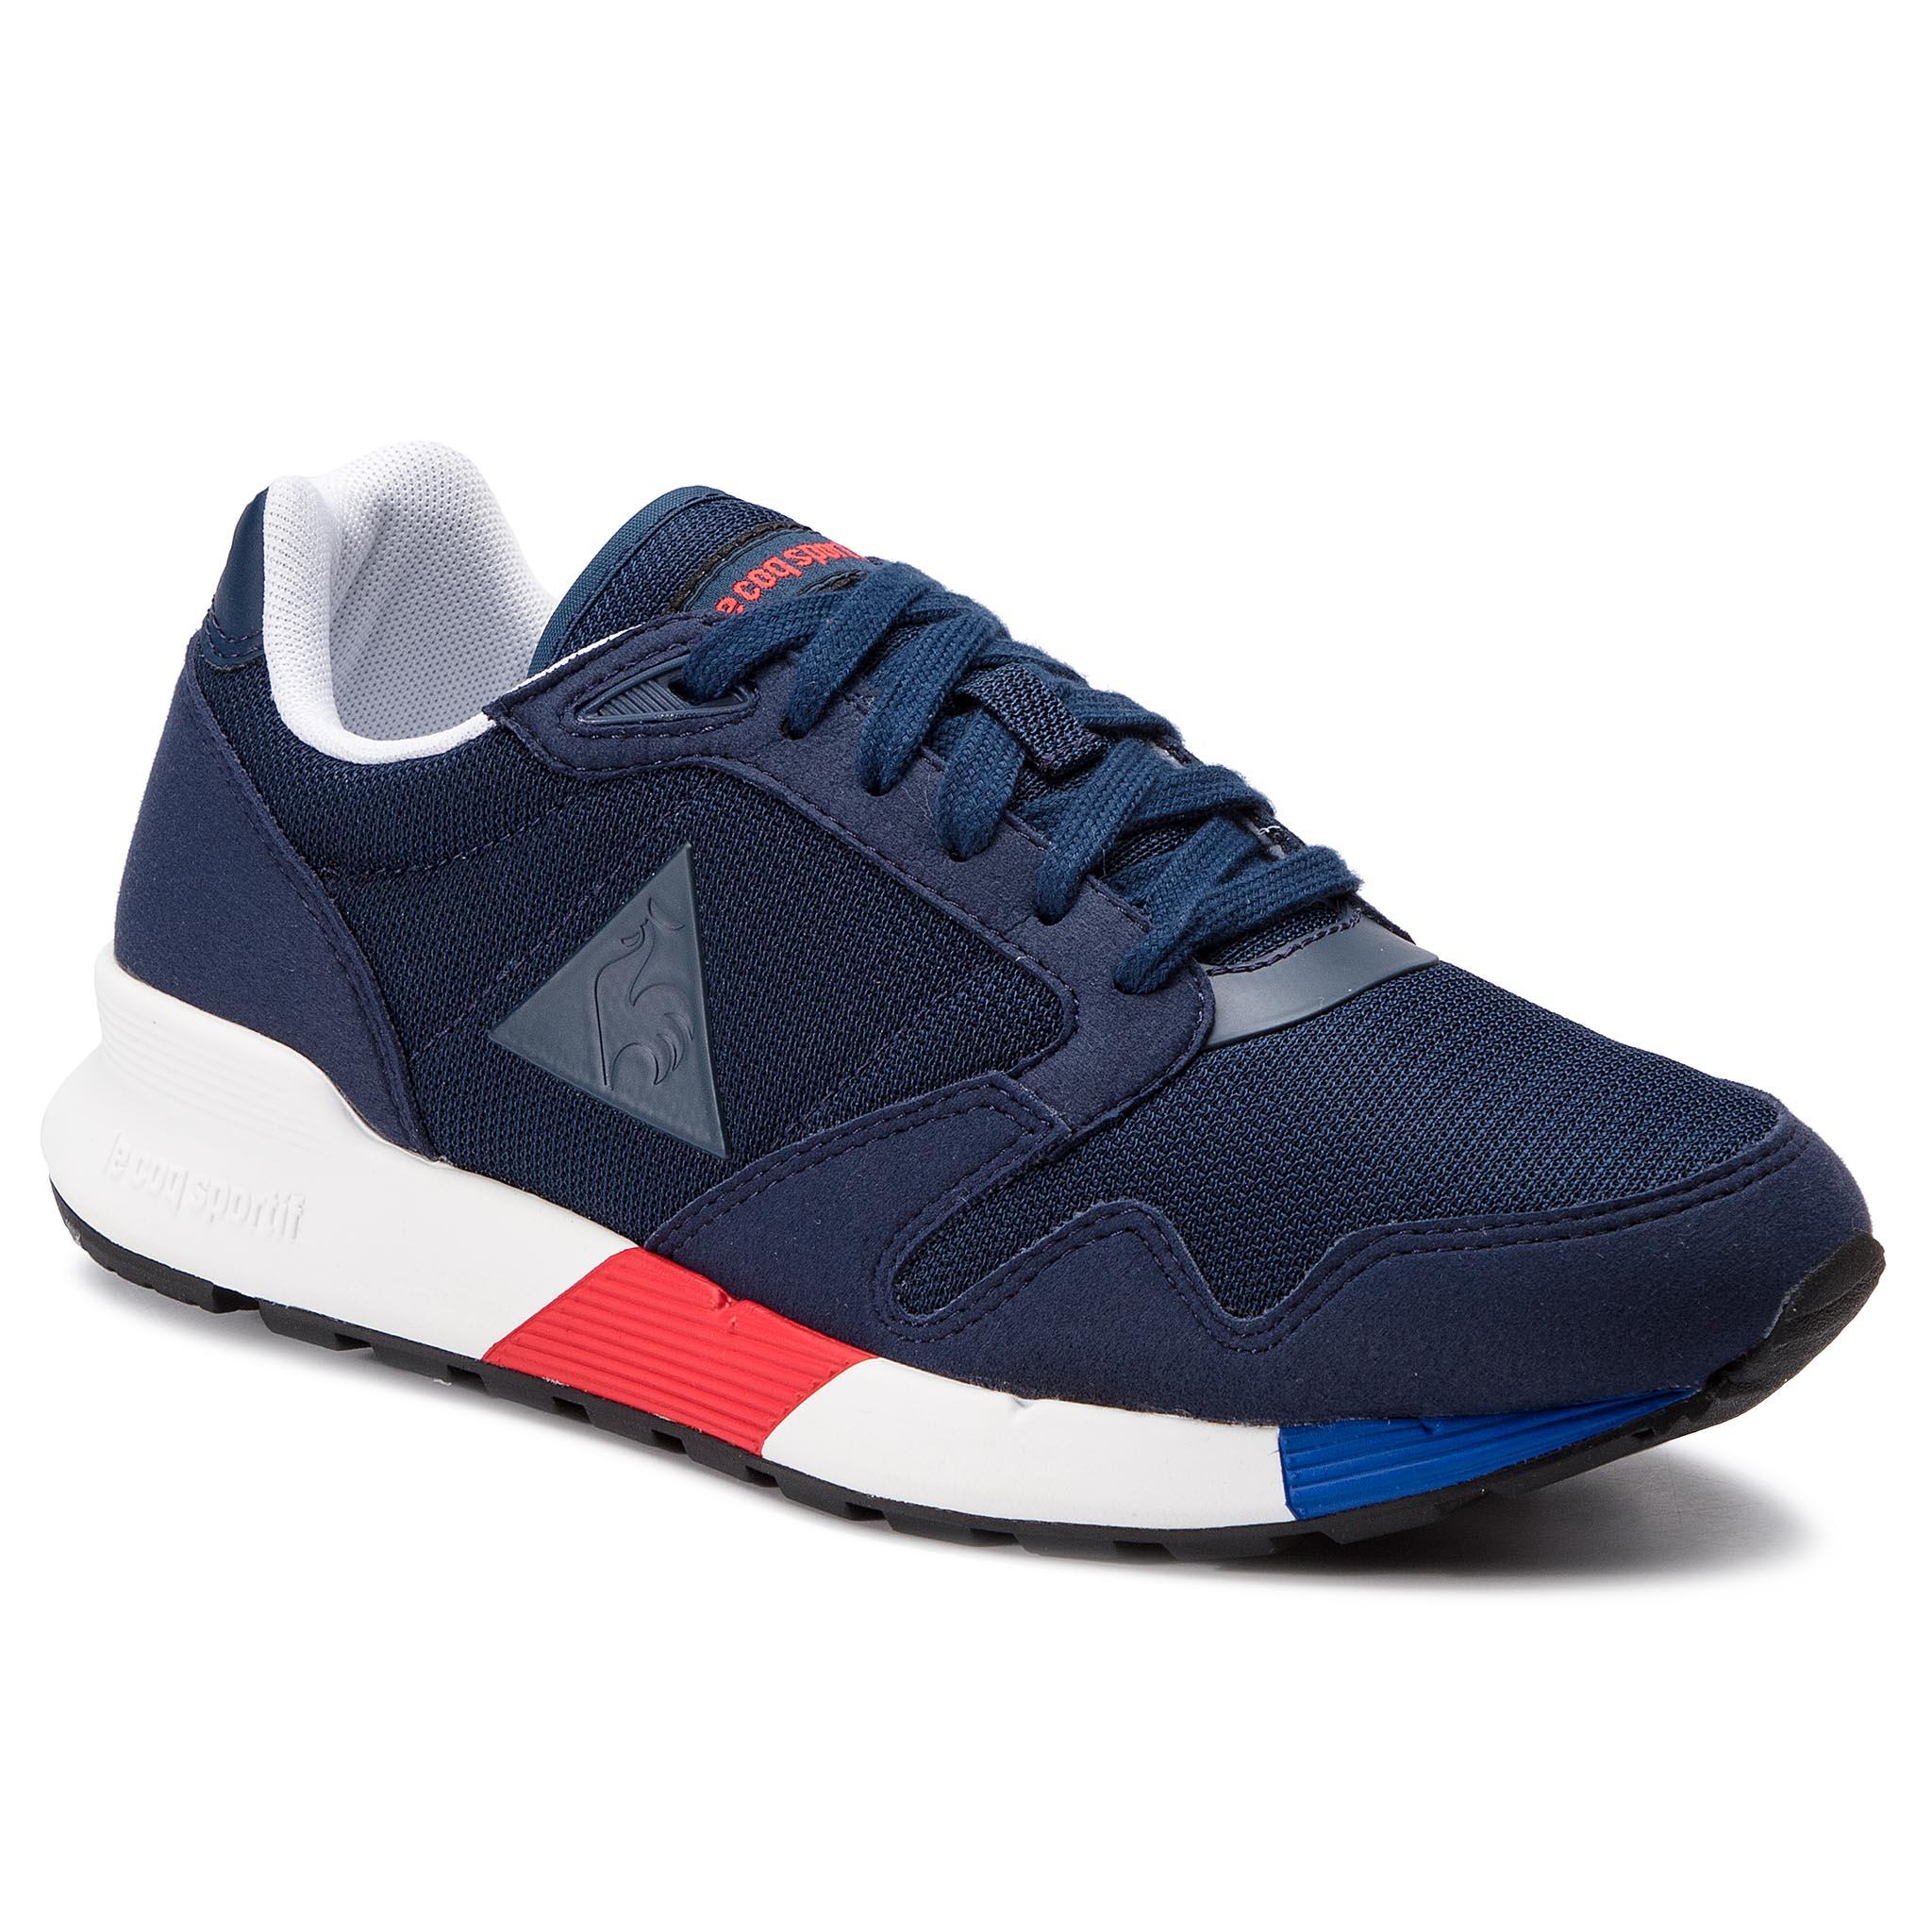 d7685e02 Sneakers LE COQ SPORTIF - Omega X 1910622 Black - Sneakers - Low ...